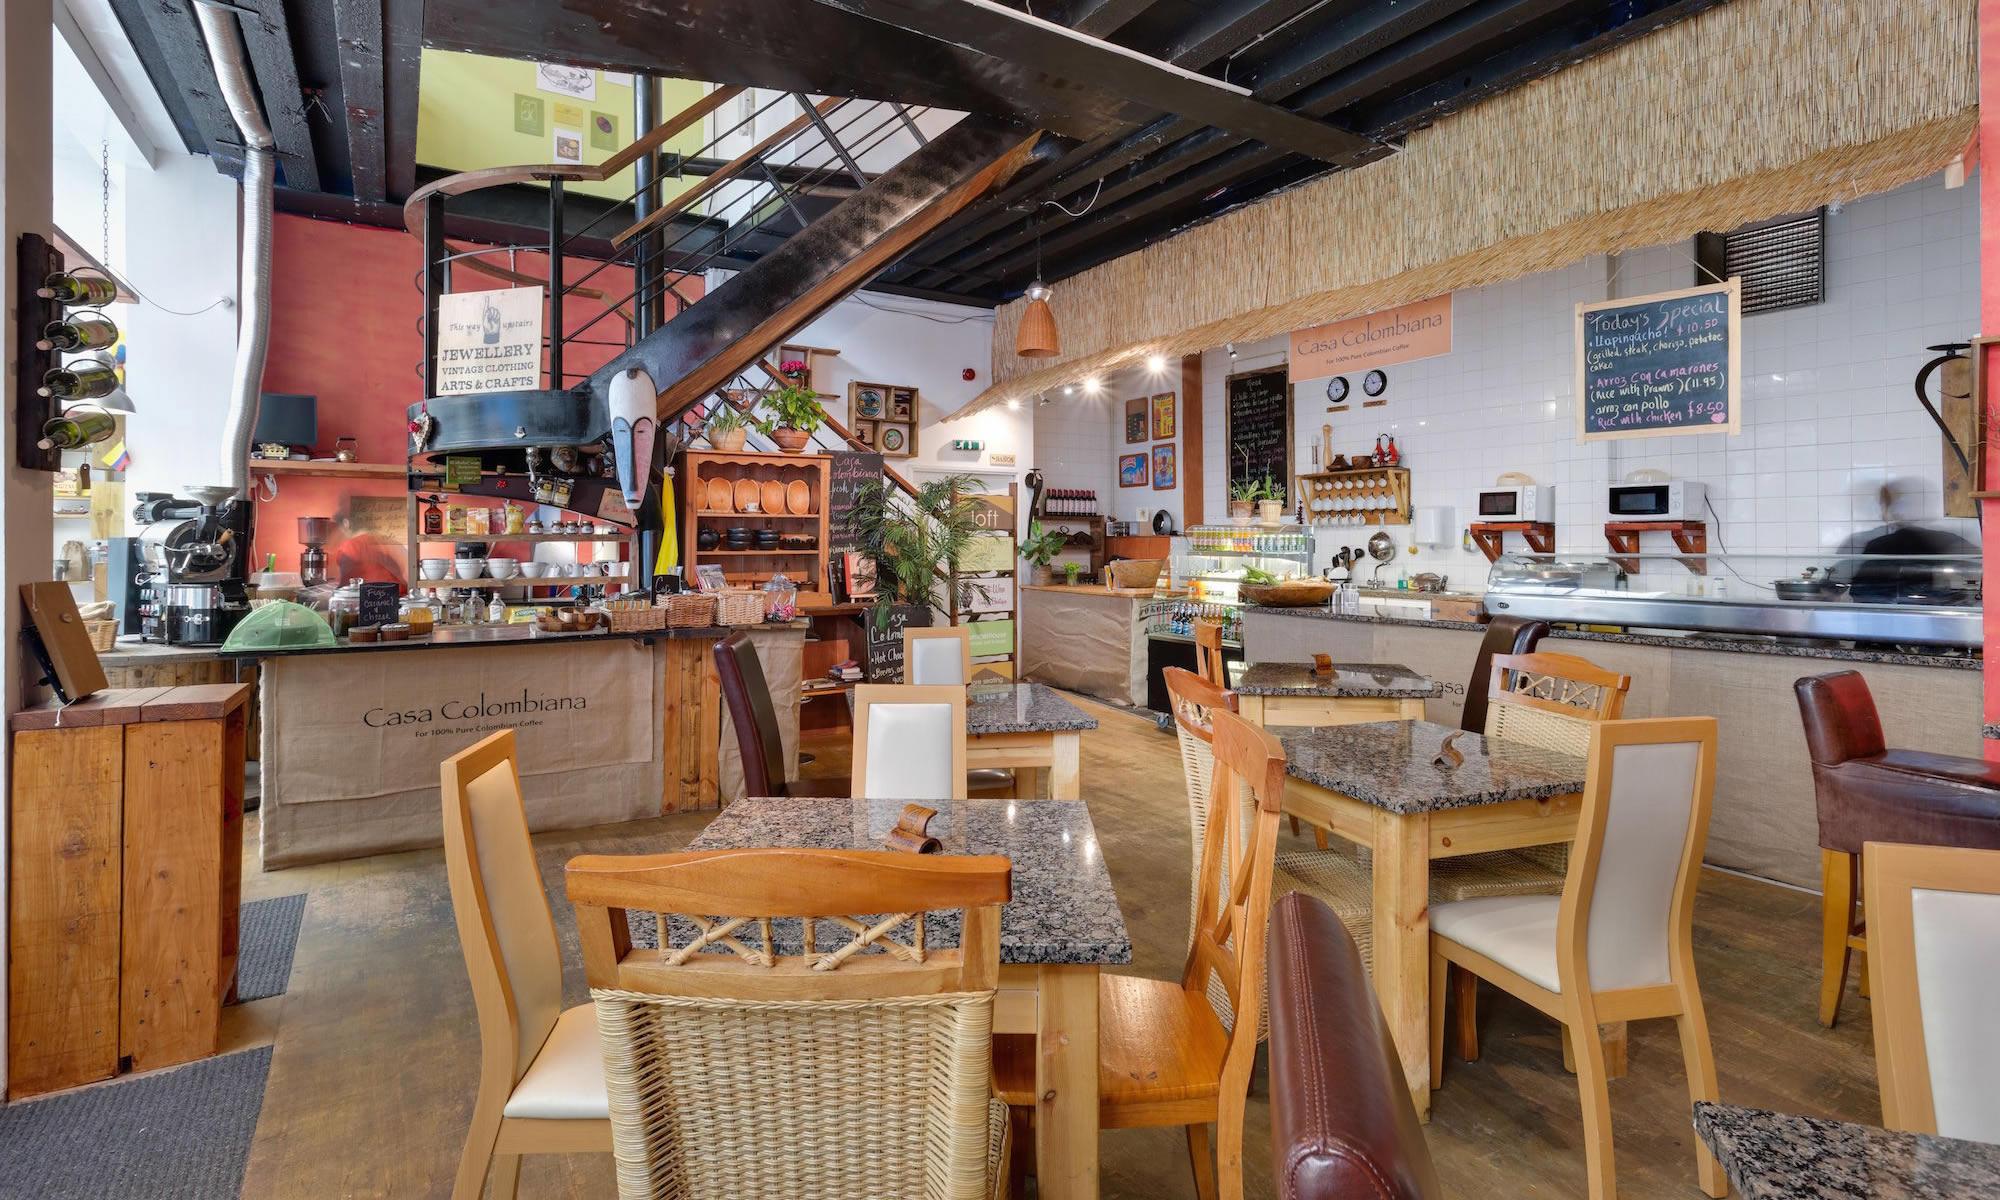 Casa Colombiana study places Leeds